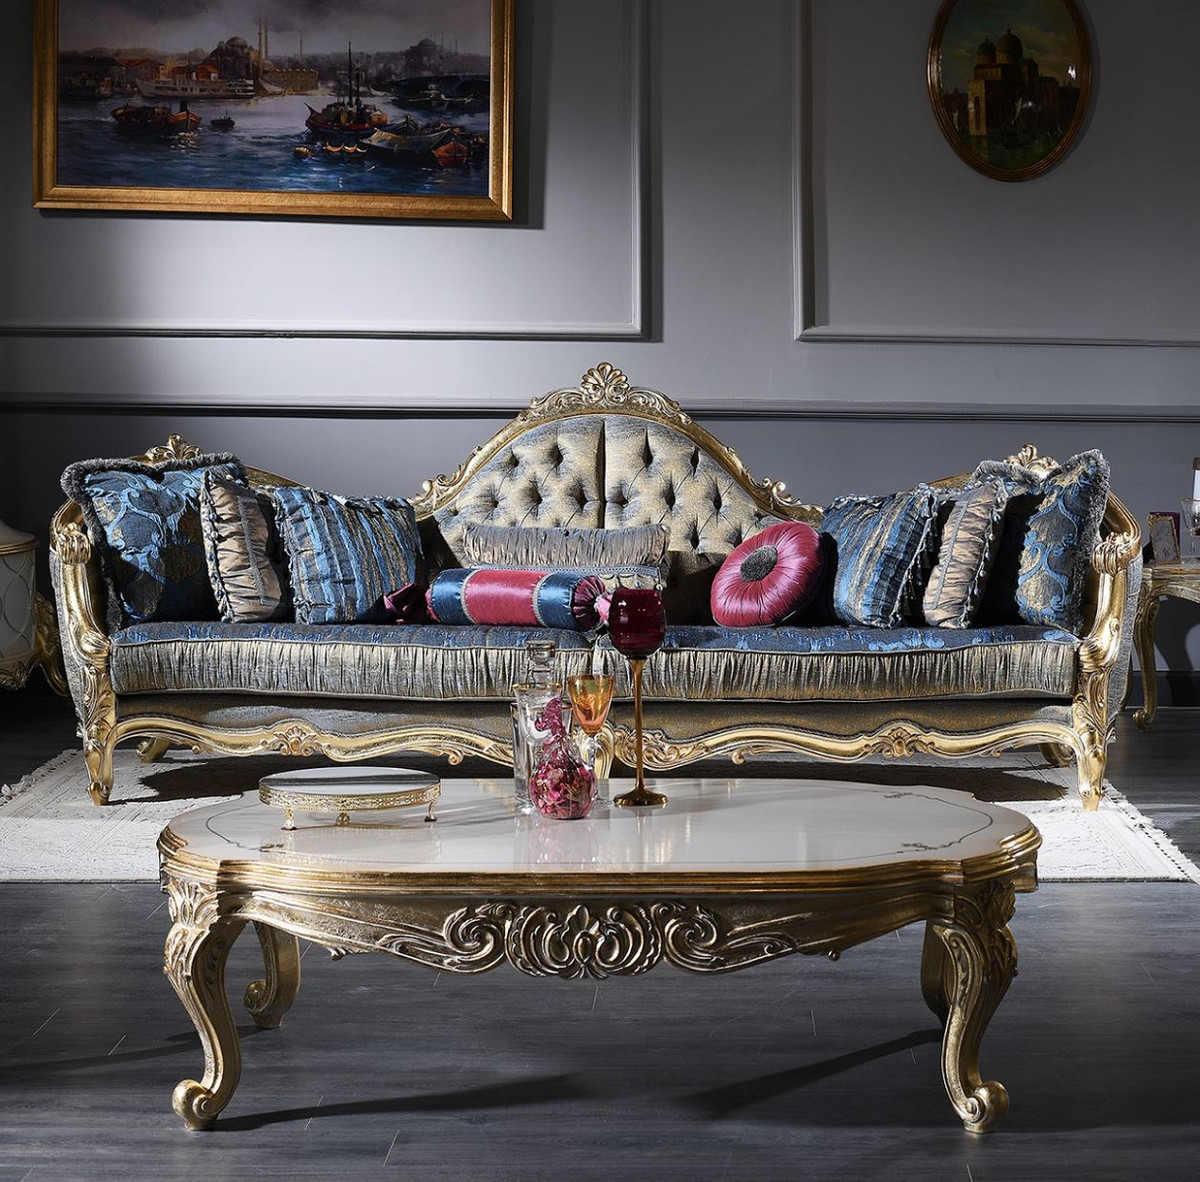 Casa Padrino Luxury Baroque Living Room Set - 16 Chesterfield Sofa